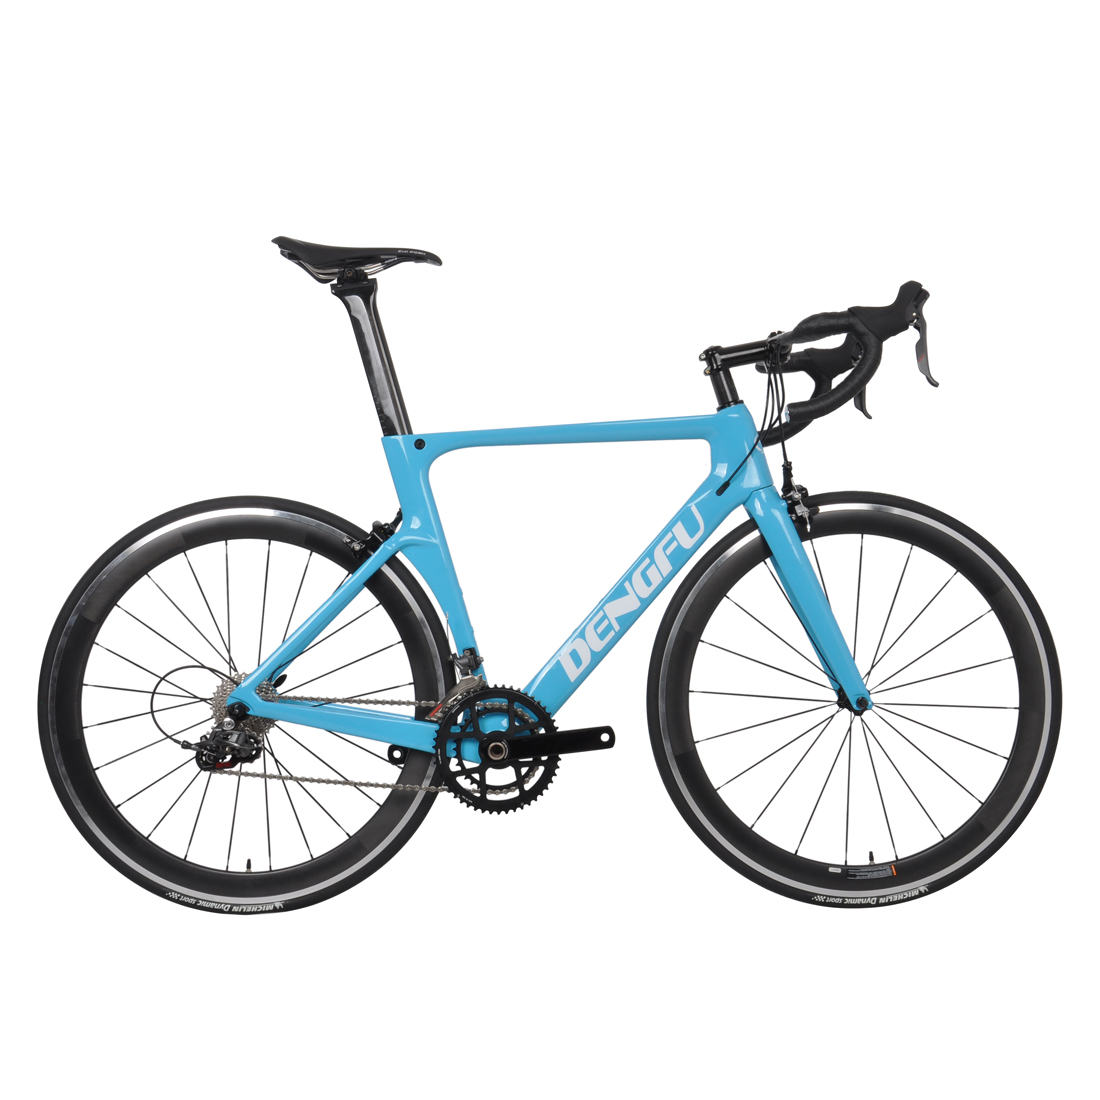 Carbon Fiber Bikes >> Best Selling Aero Racing R06 Frame Carbon Fiber Bikes V Brake Sky Blue Color Complete Carbon Road Bike Buy Carbon Road Bike Carbon Fiber